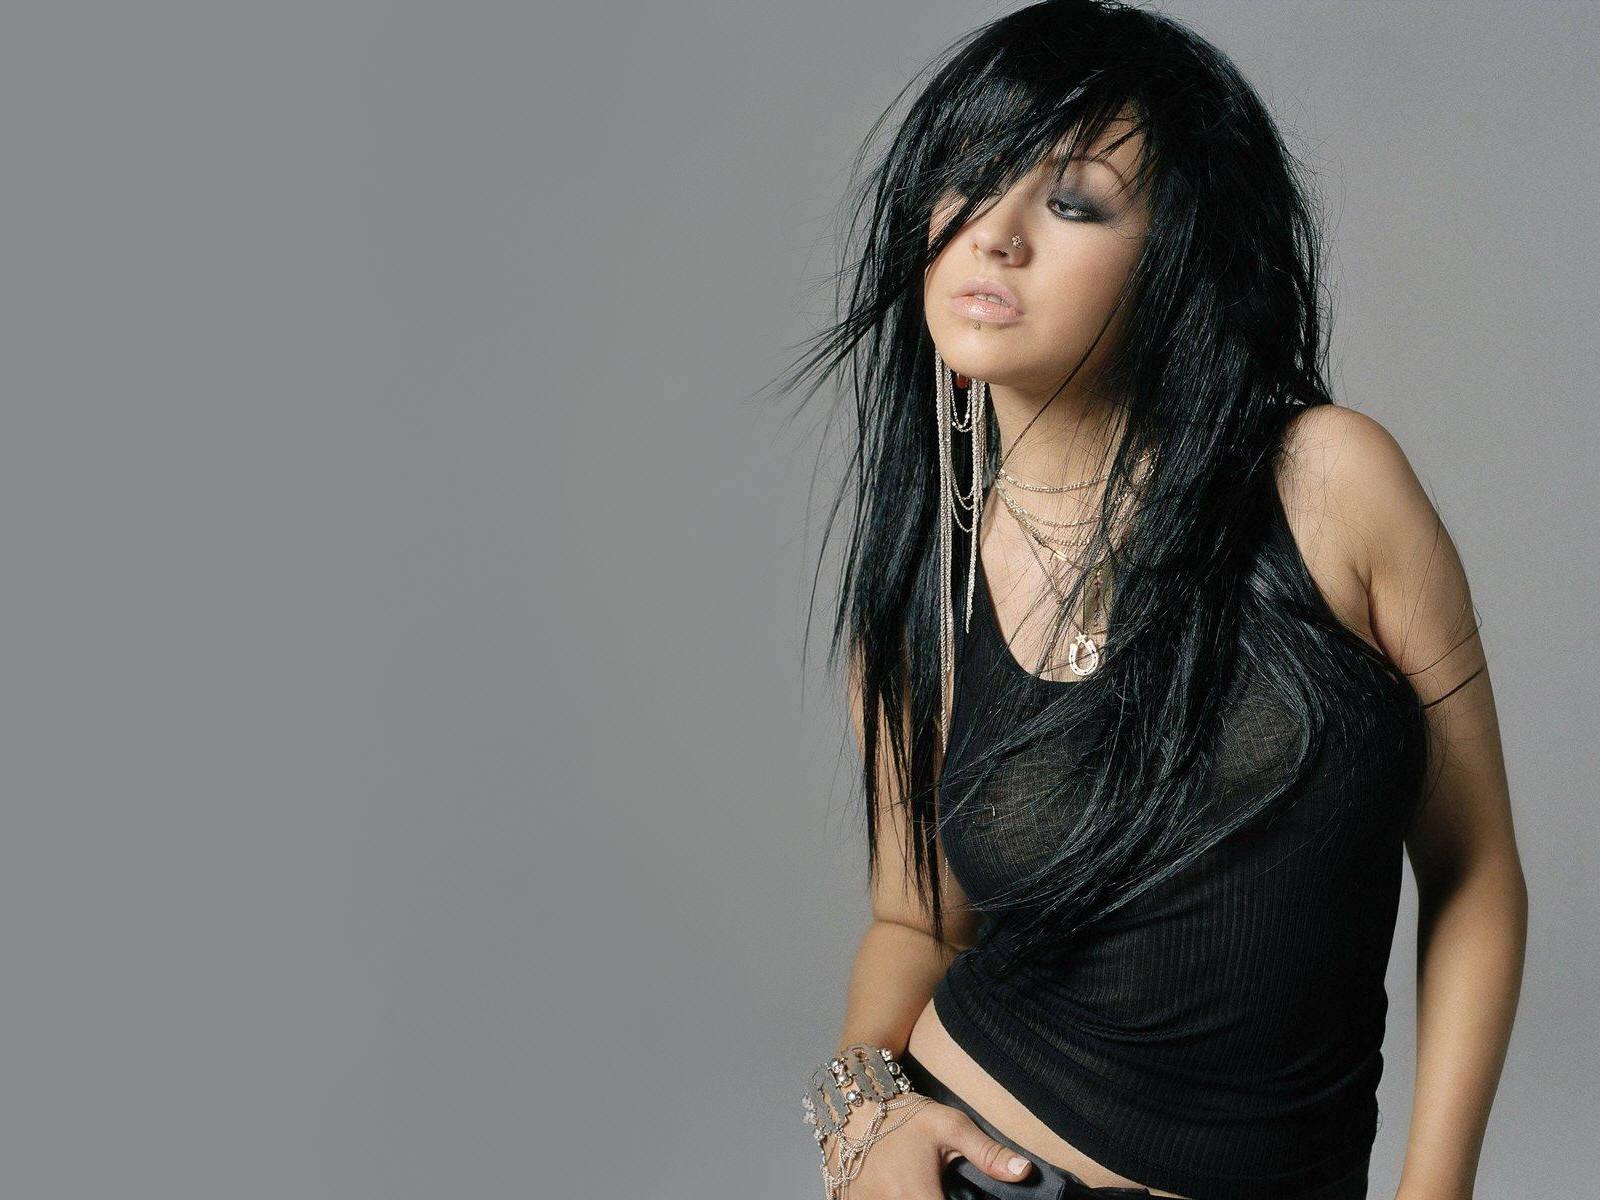 Christina Aguilera Modeling Pose In Black Dress Red Lips